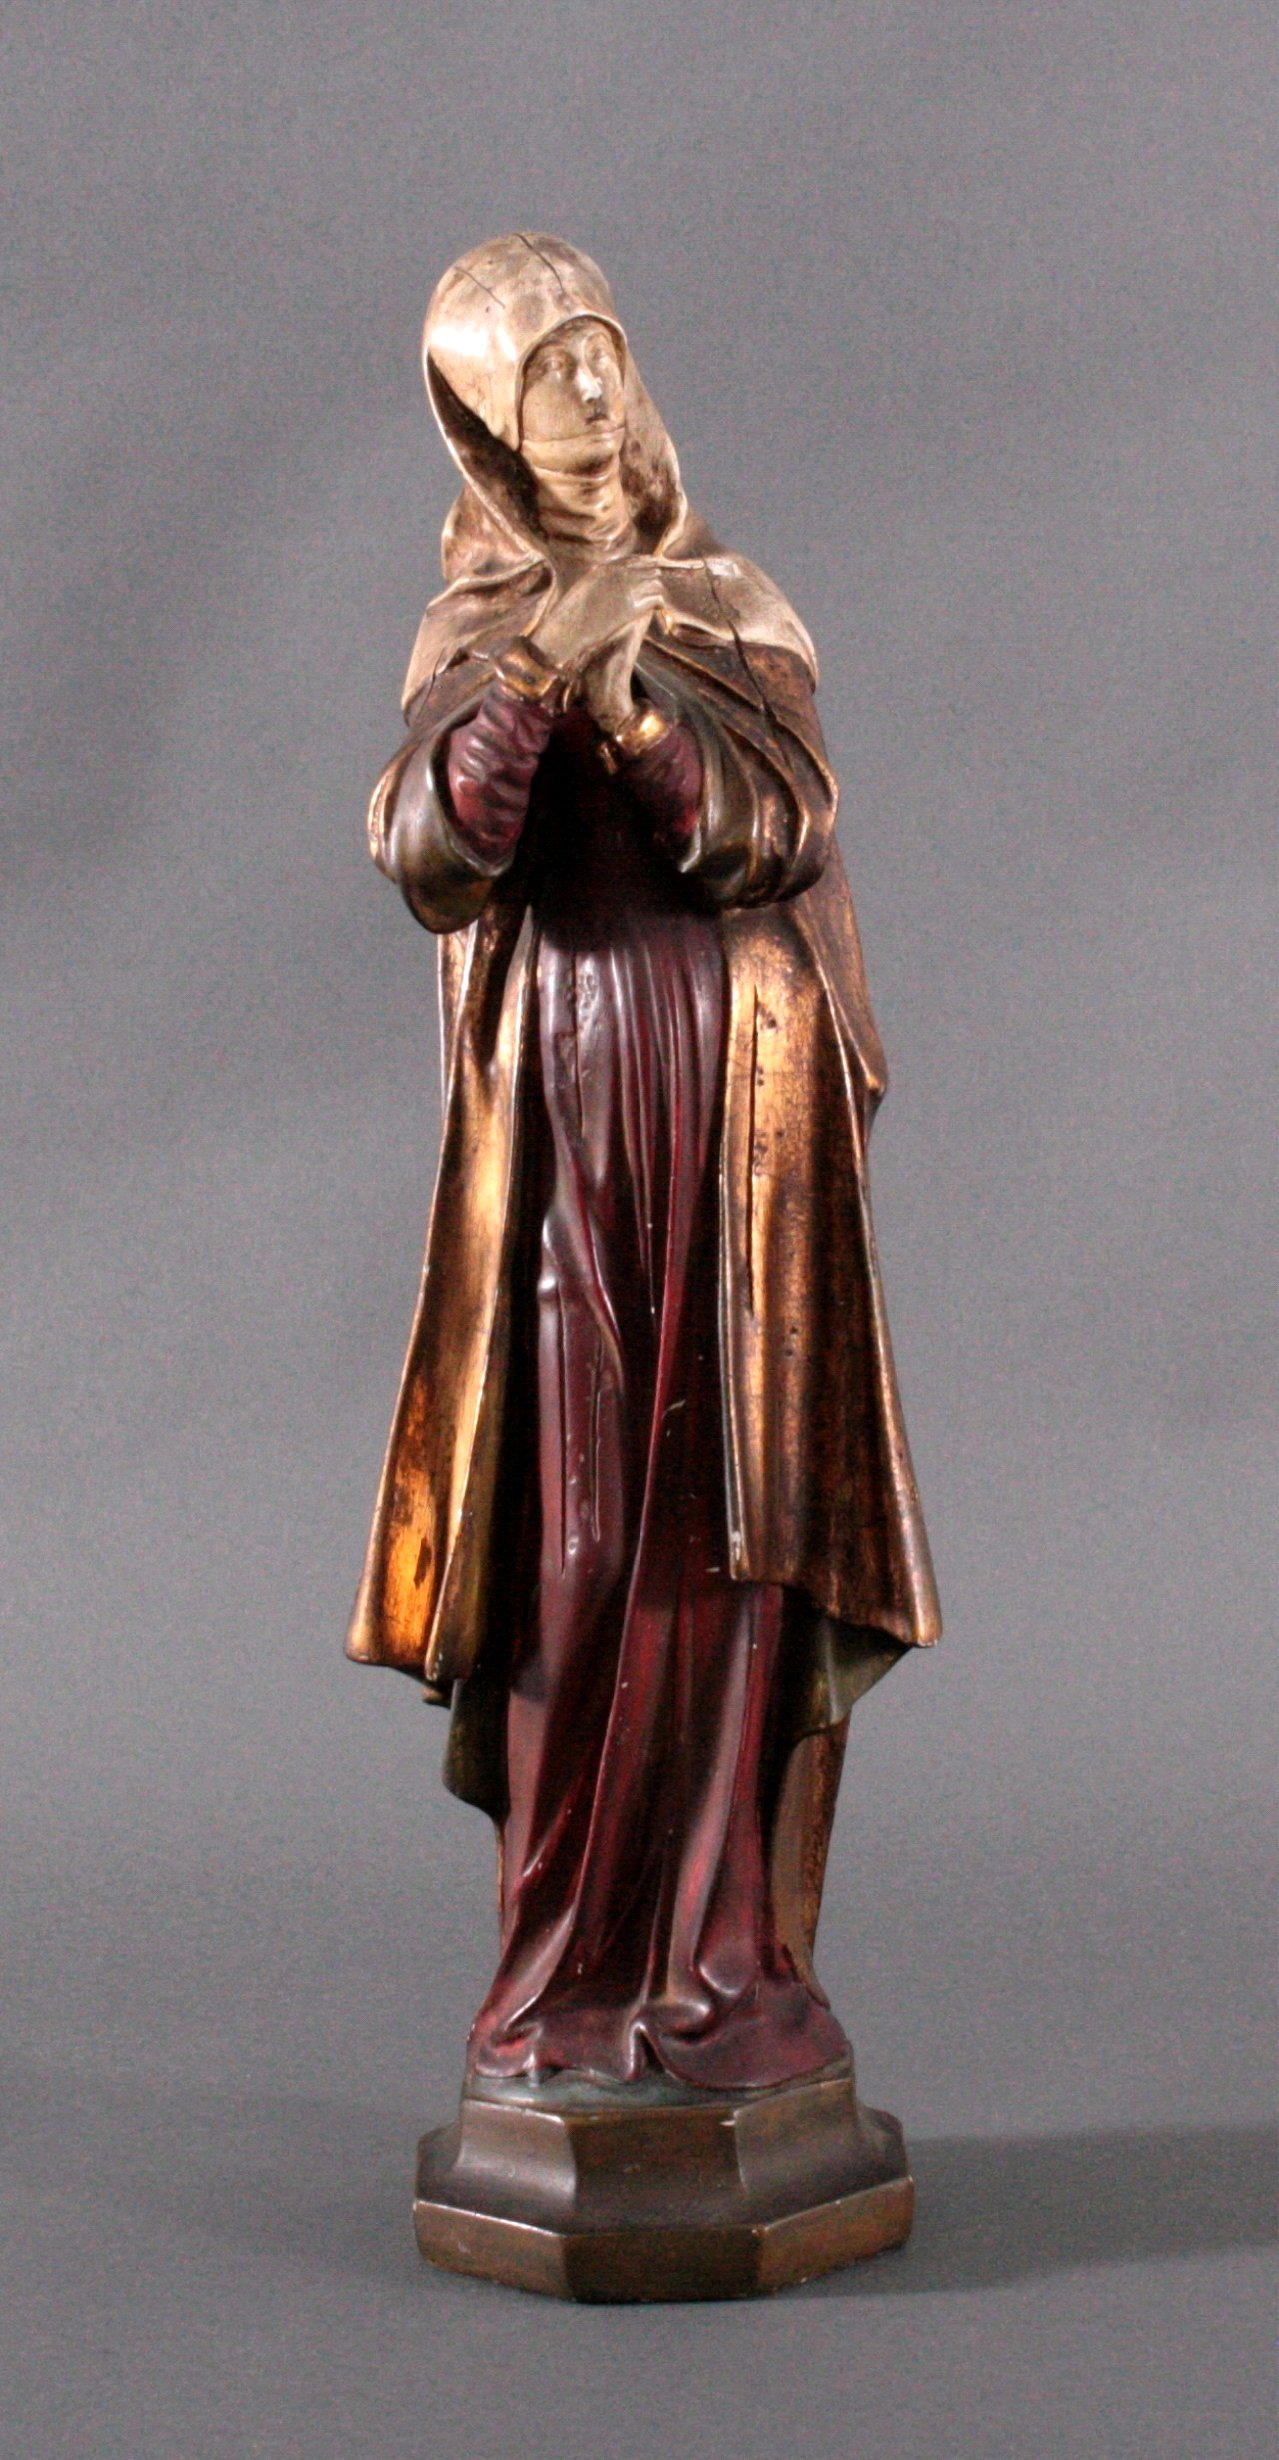 Betende Heilige Anna, Schwanger, 19. Jh.